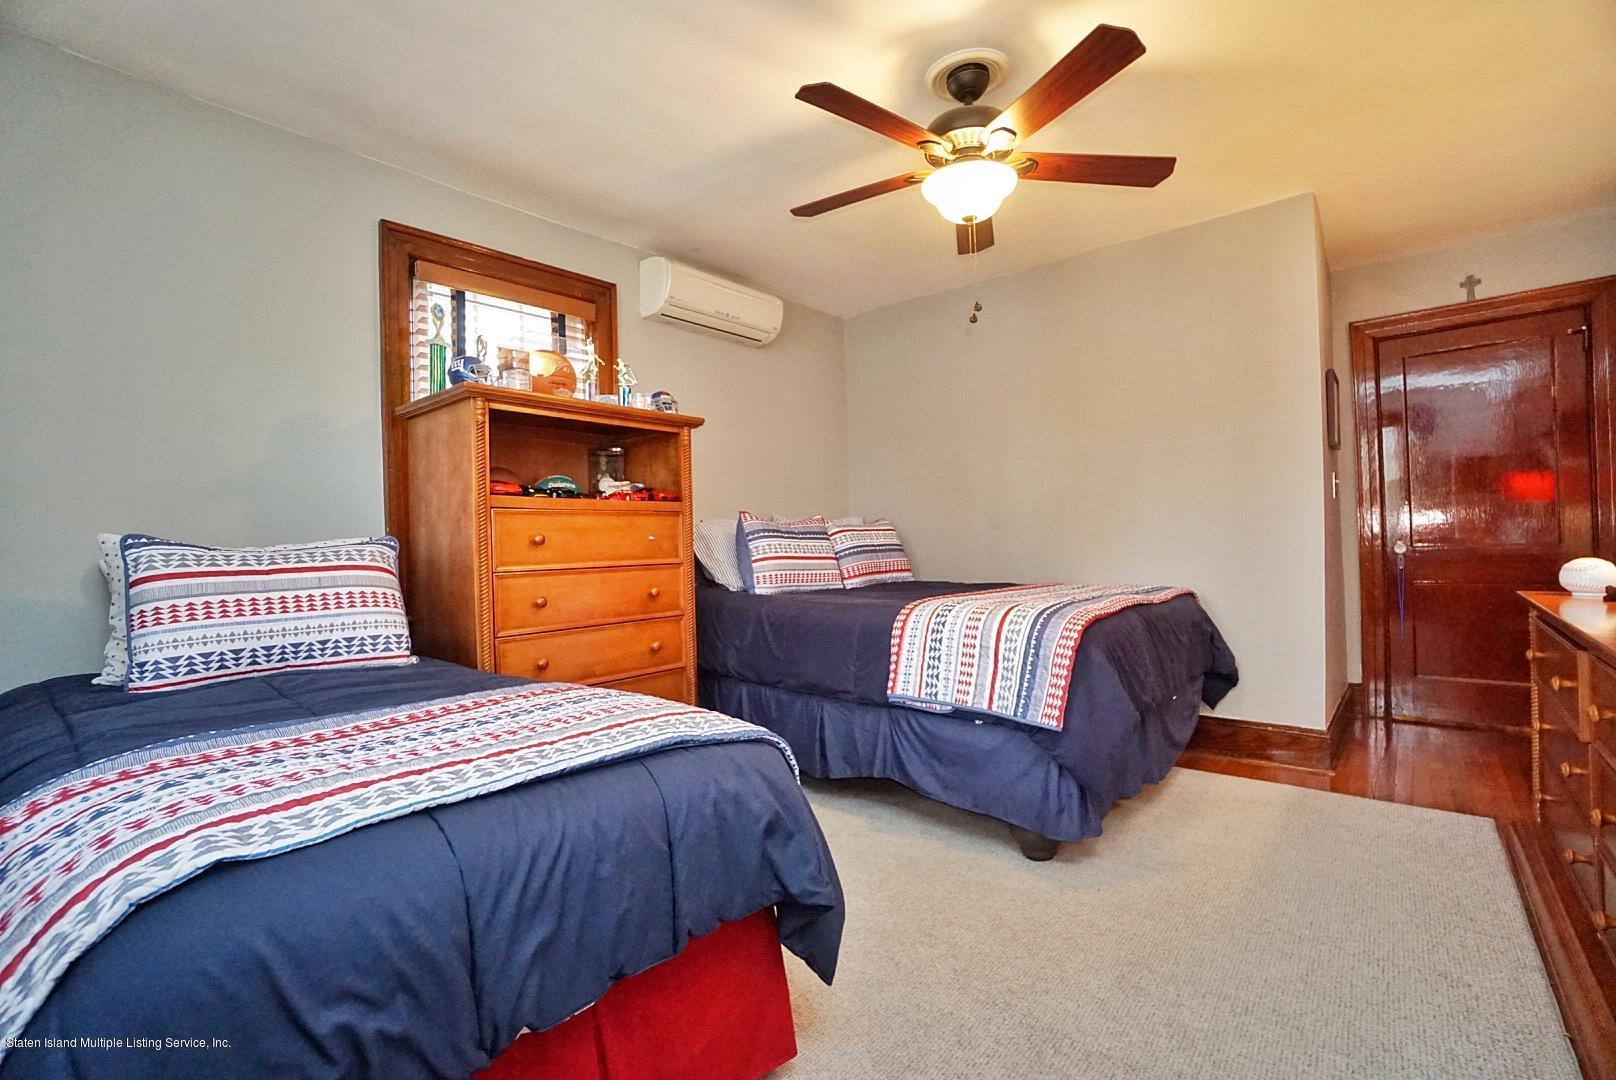 Single Family - Detached 171 Keiber Court  Staten Island, NY 10314, MLS-1127425-42